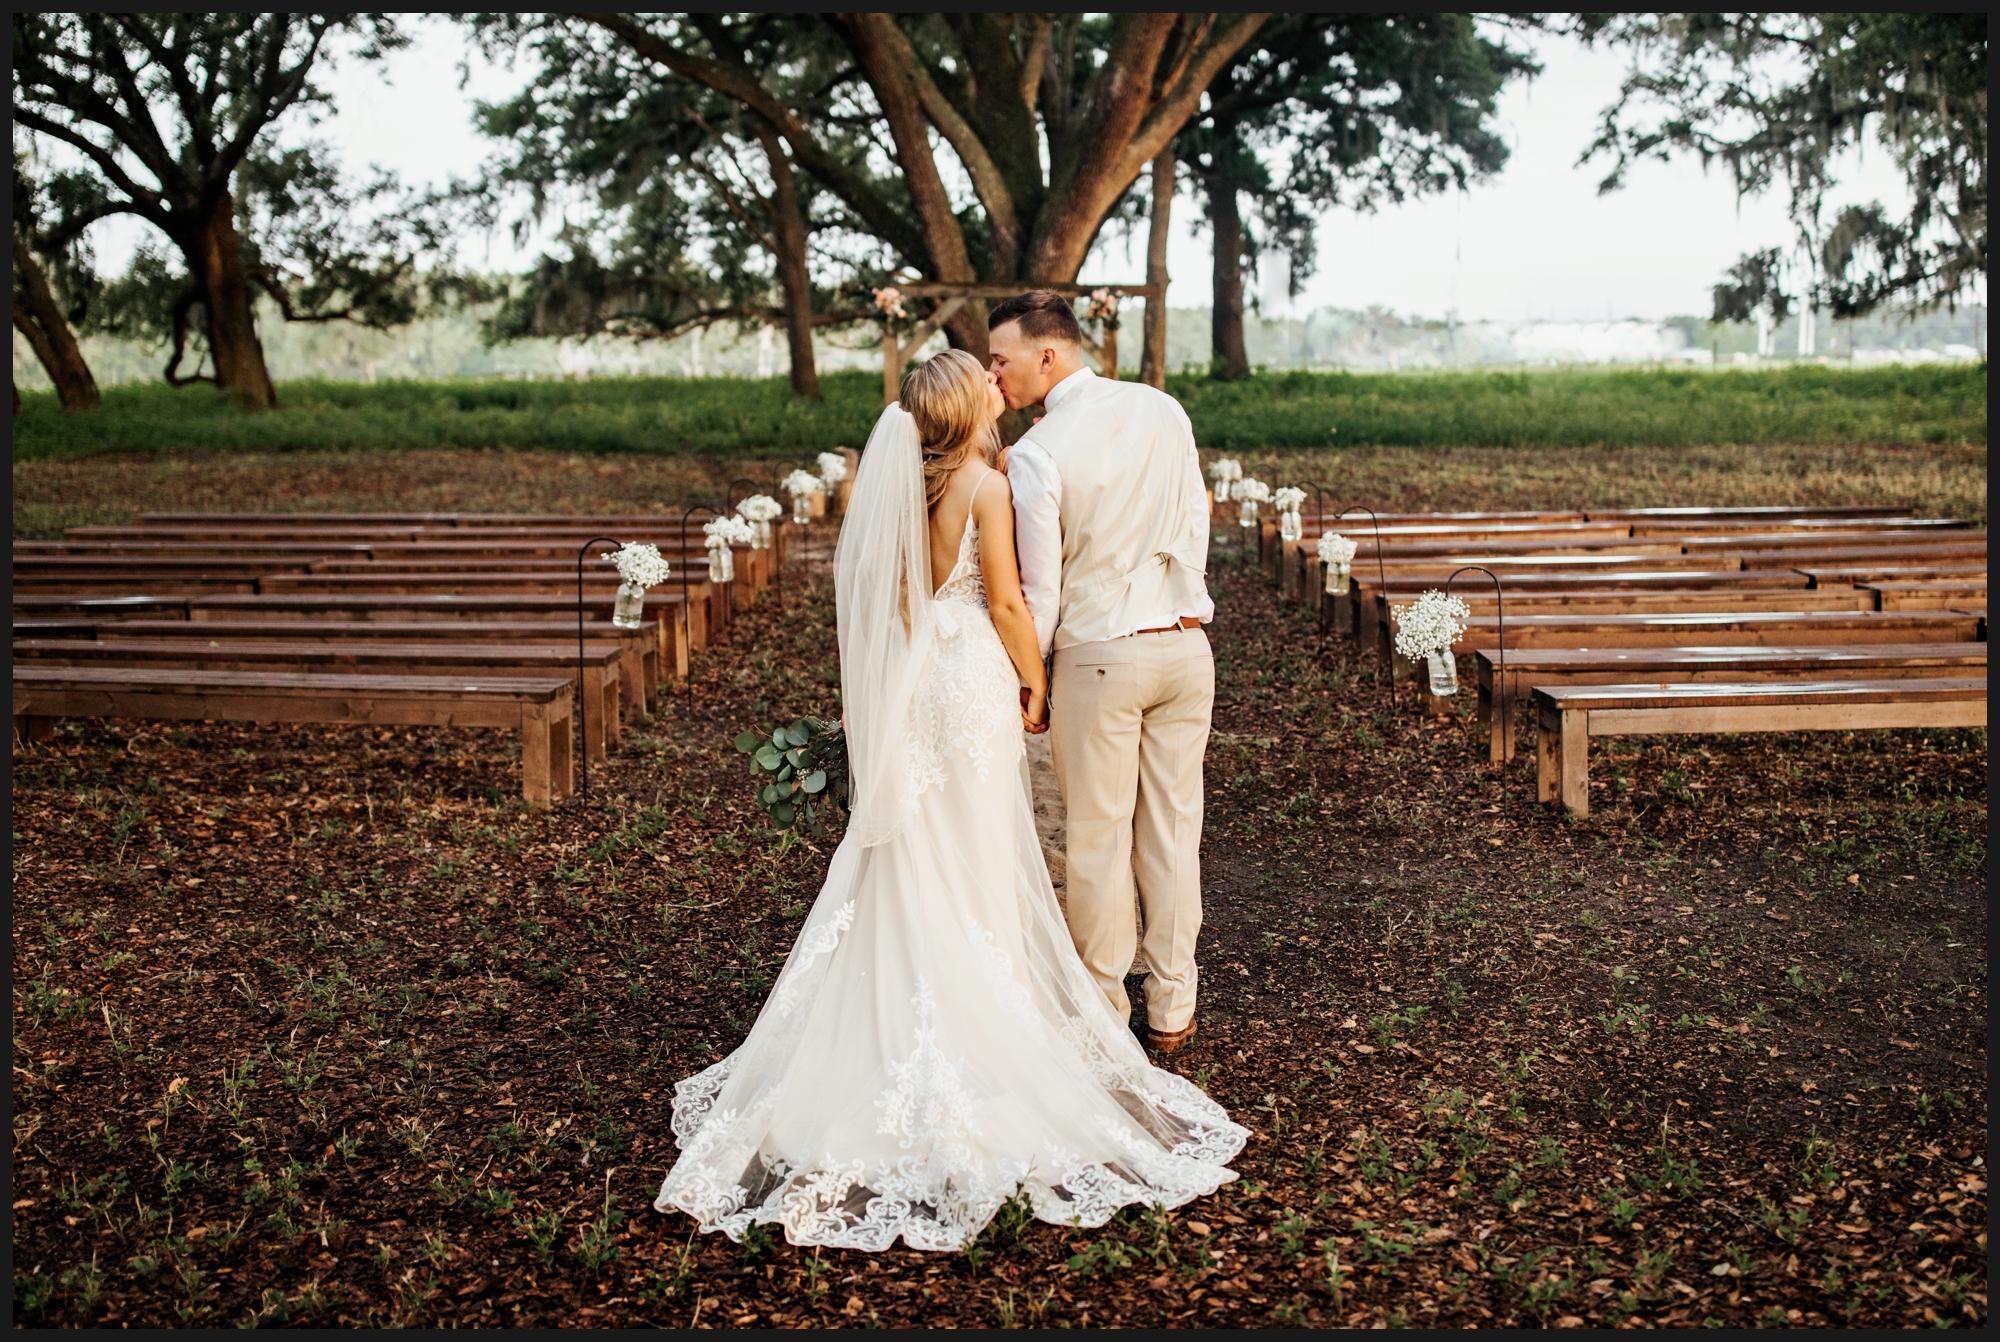 Orlando-Wedding-Photographer-destination-wedding-photographer-florida-wedding-photographer-hawaii-wedding-photographer_0329.jpg